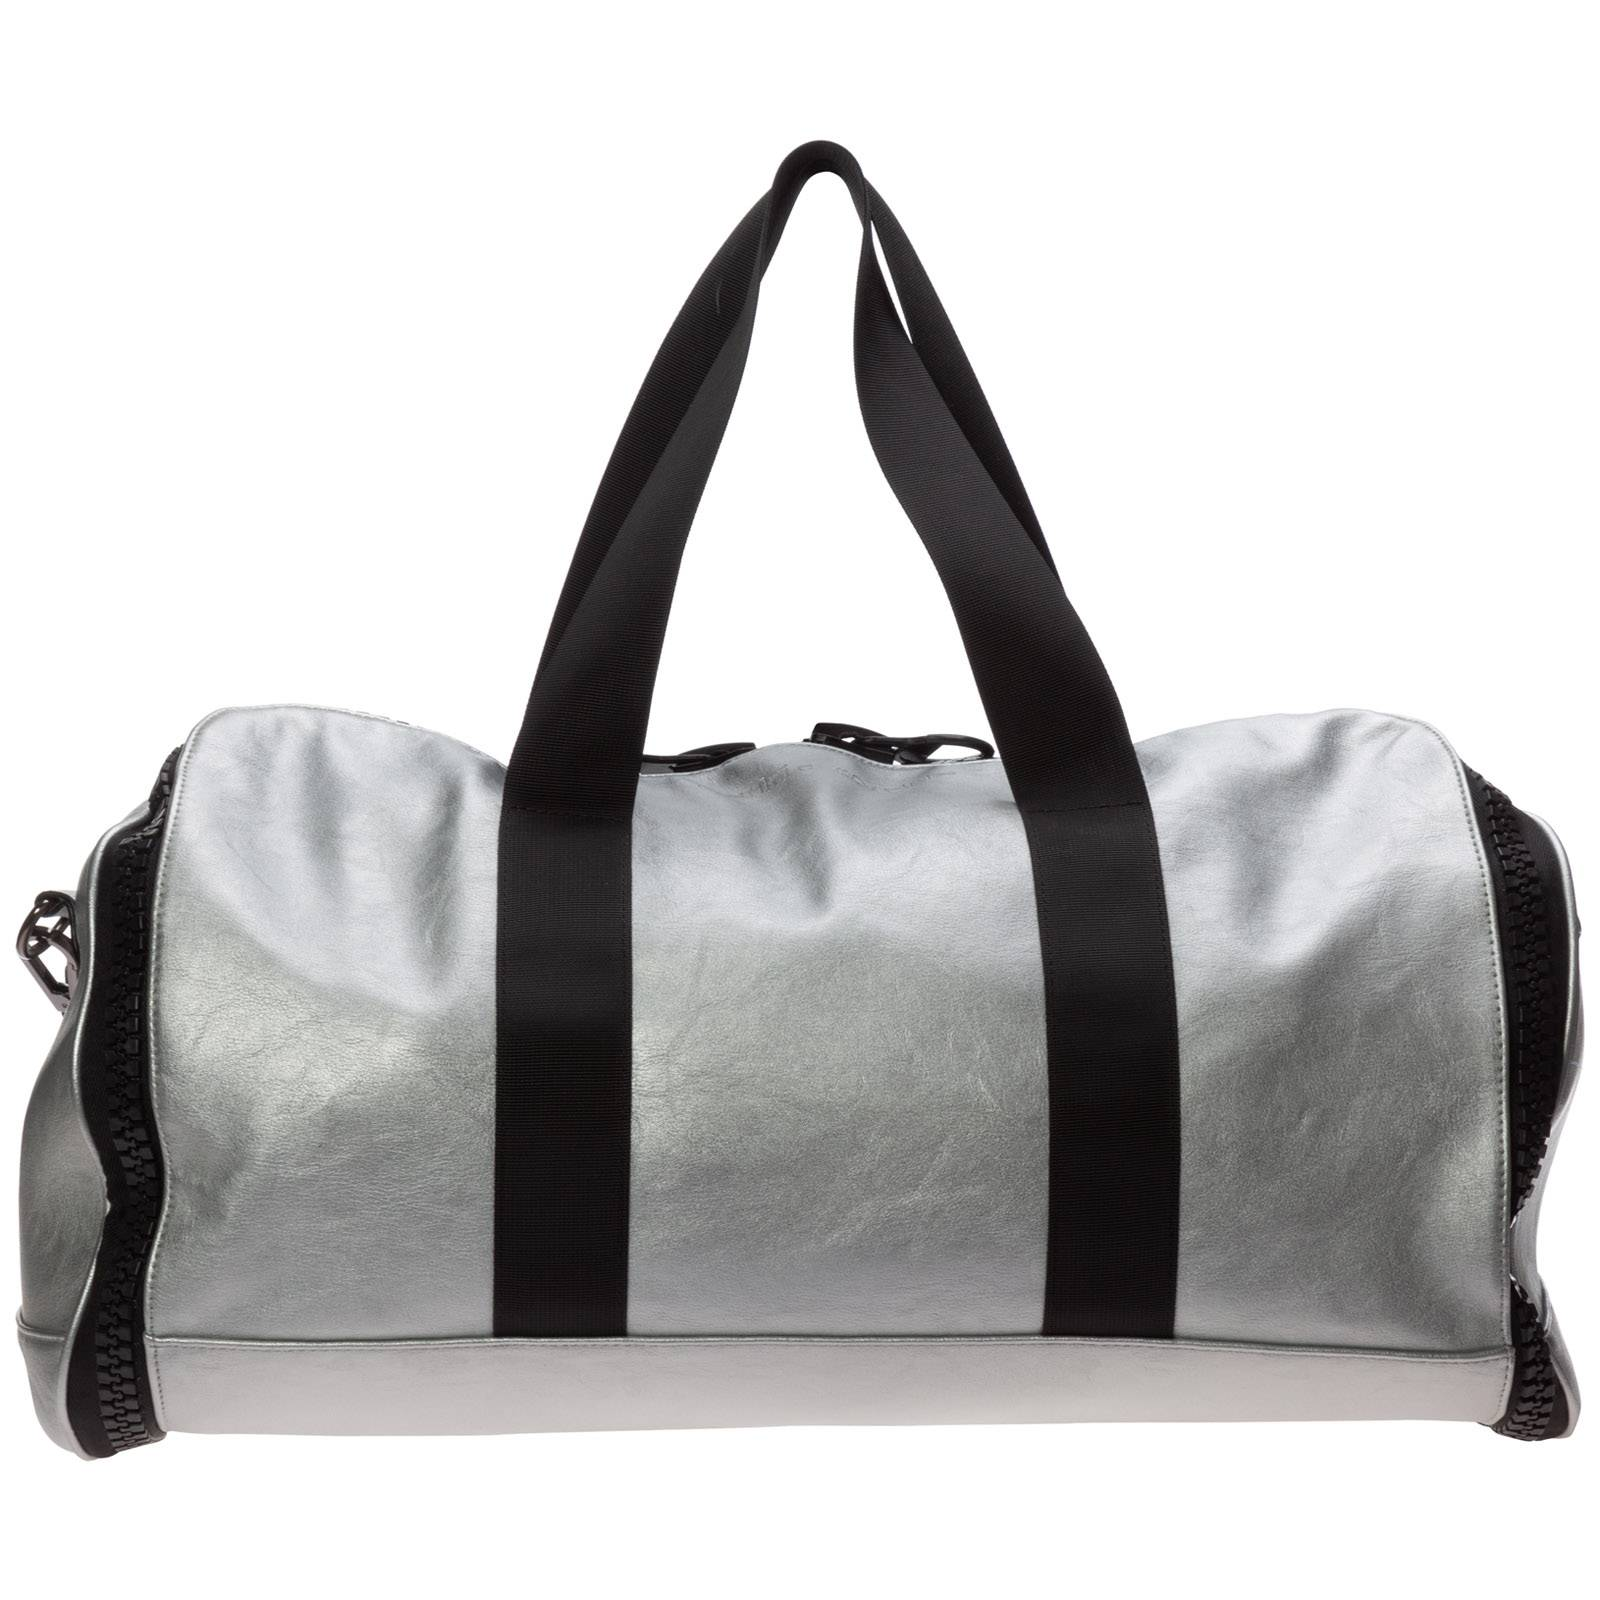 Frankie Morello Men's fitness gym sports bag  - Silver